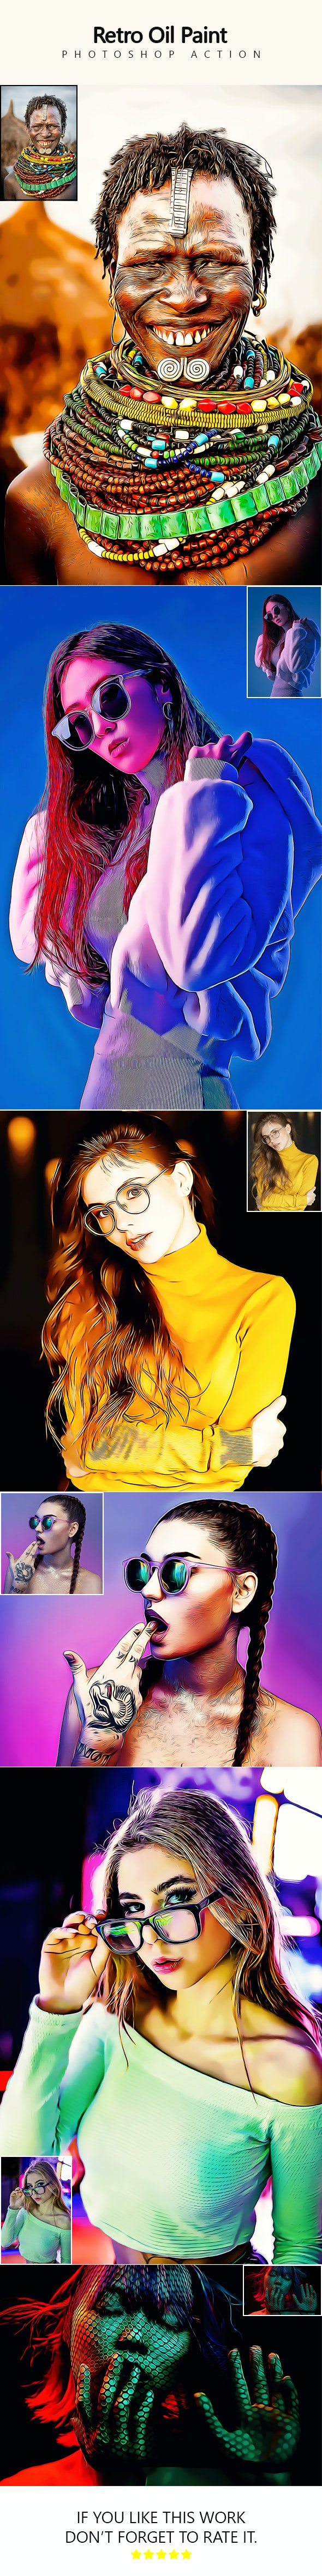 Retro Oil Paint - Photoshop Action - Photo Effects Actions